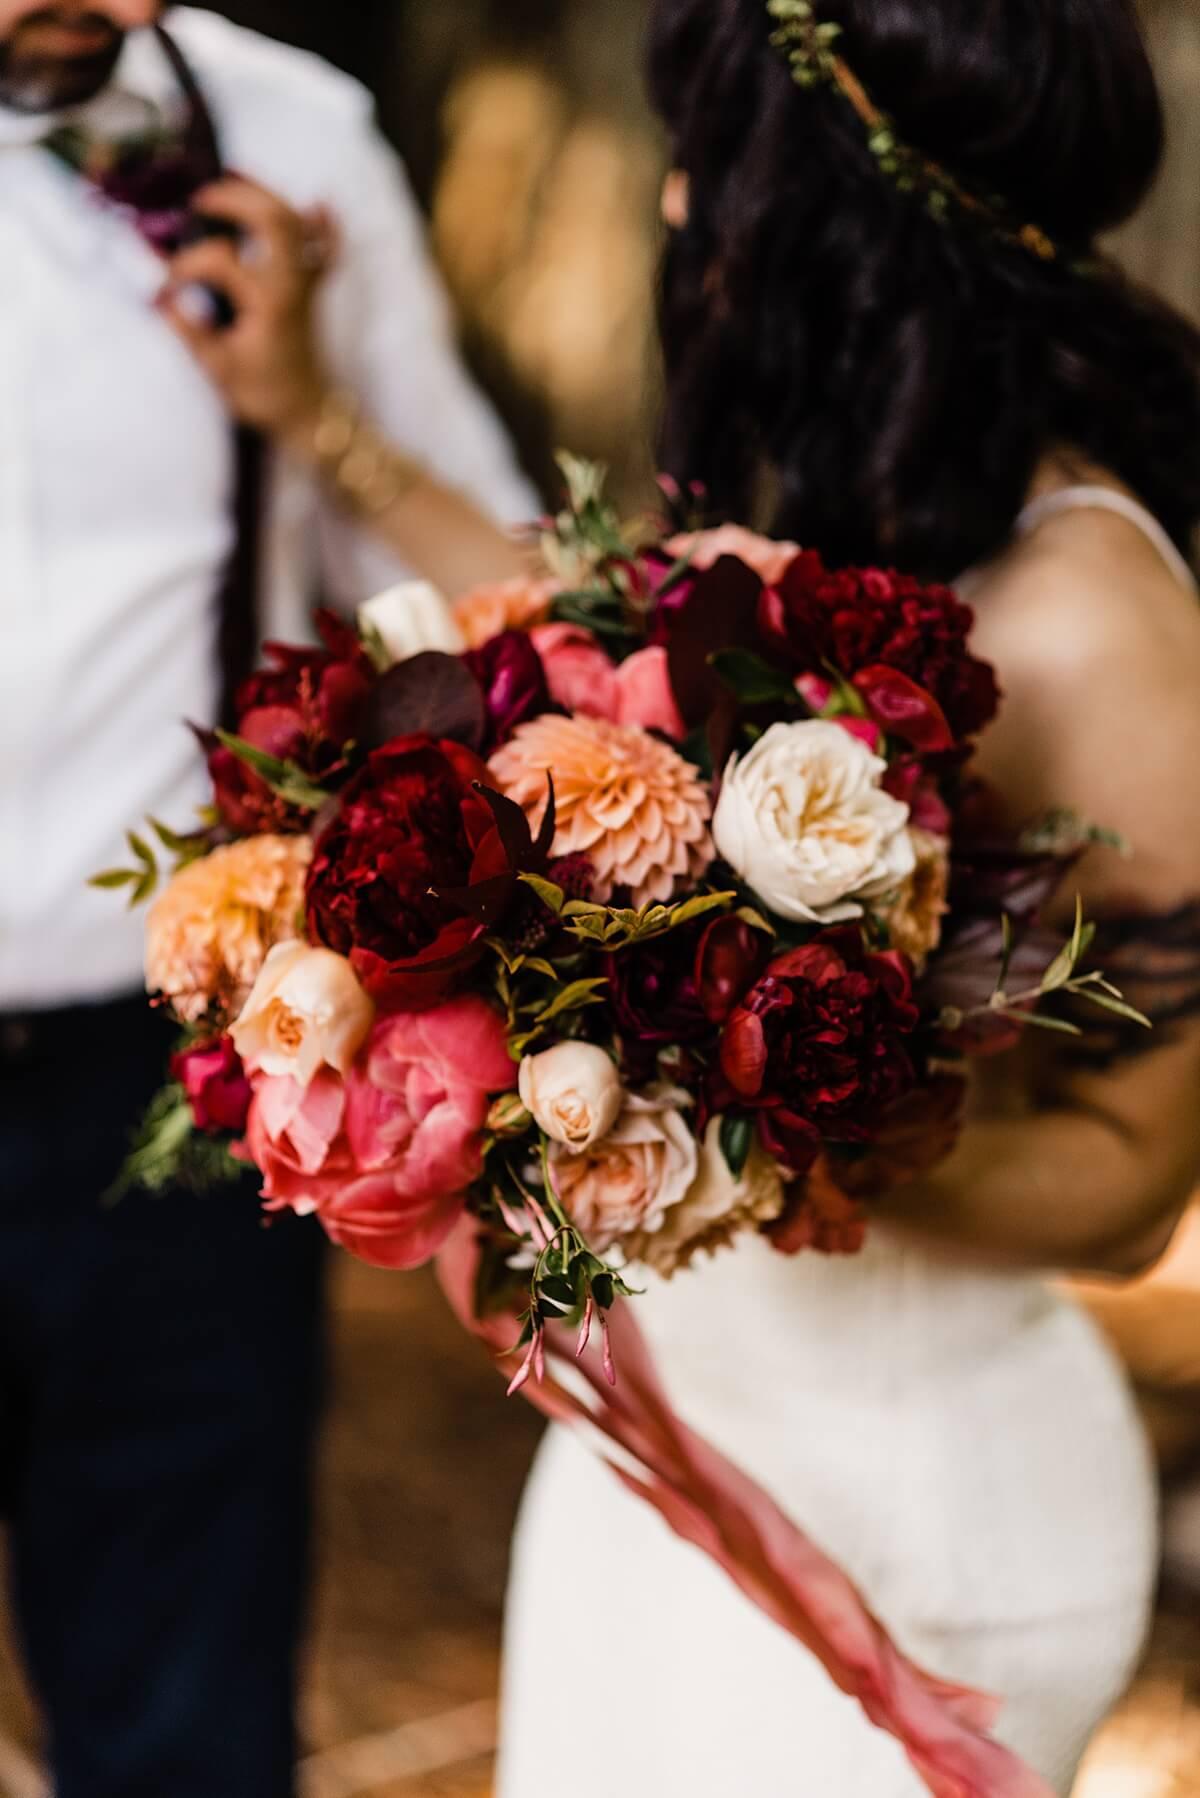 Allison-Brooks-Jedediah-Smiith-Redwoods-Adventure-Elopement-Wedding-S-Photography-Blog_0005.jpg